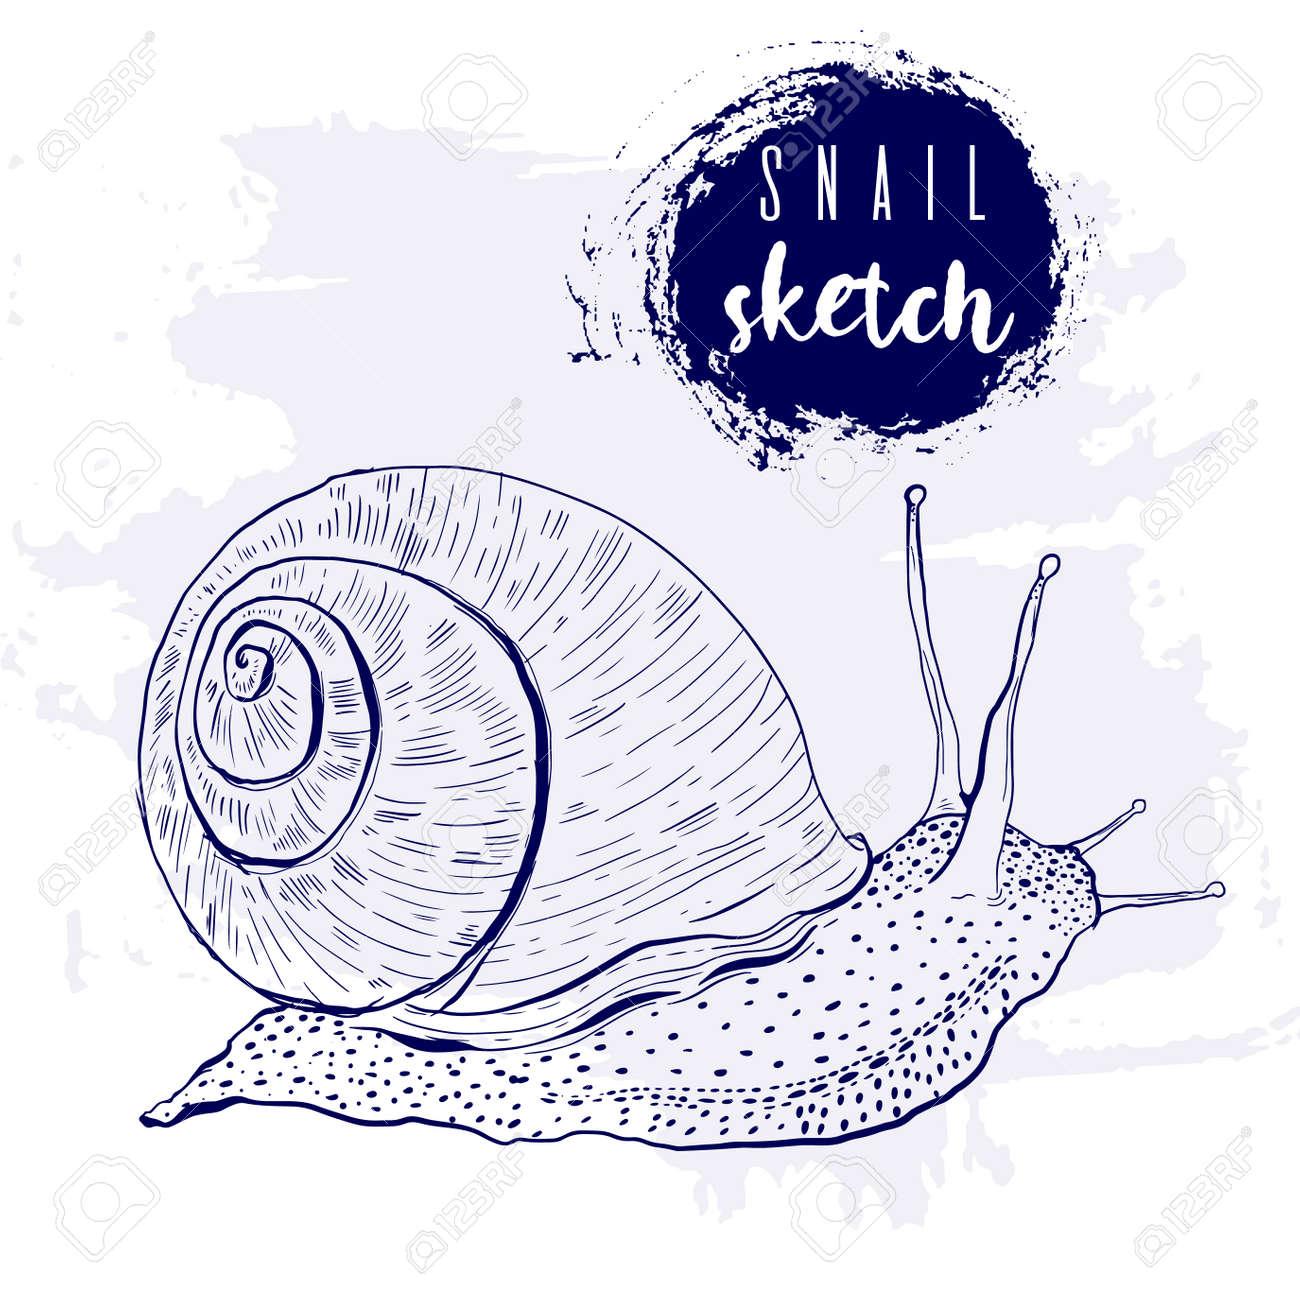 Vintage animal snail marine sketch.Retro line style.Hand drawn underwater - 169556217